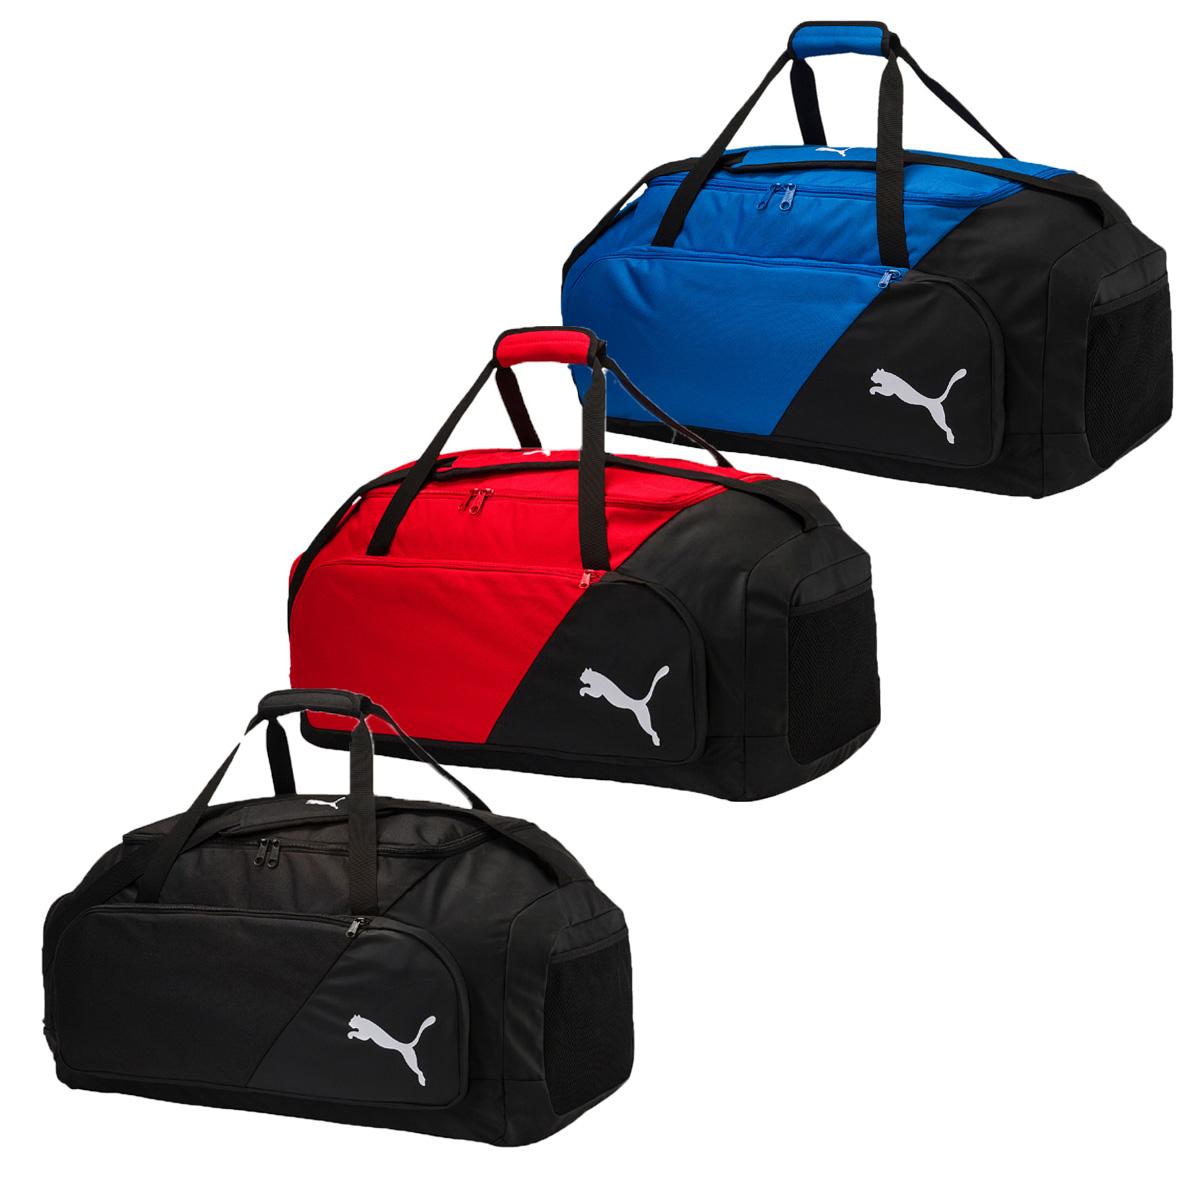 38ac4ee33233fa Details zu Puma Sporttasche Liga Large Bag schwarz rot blau alle Farben NEU